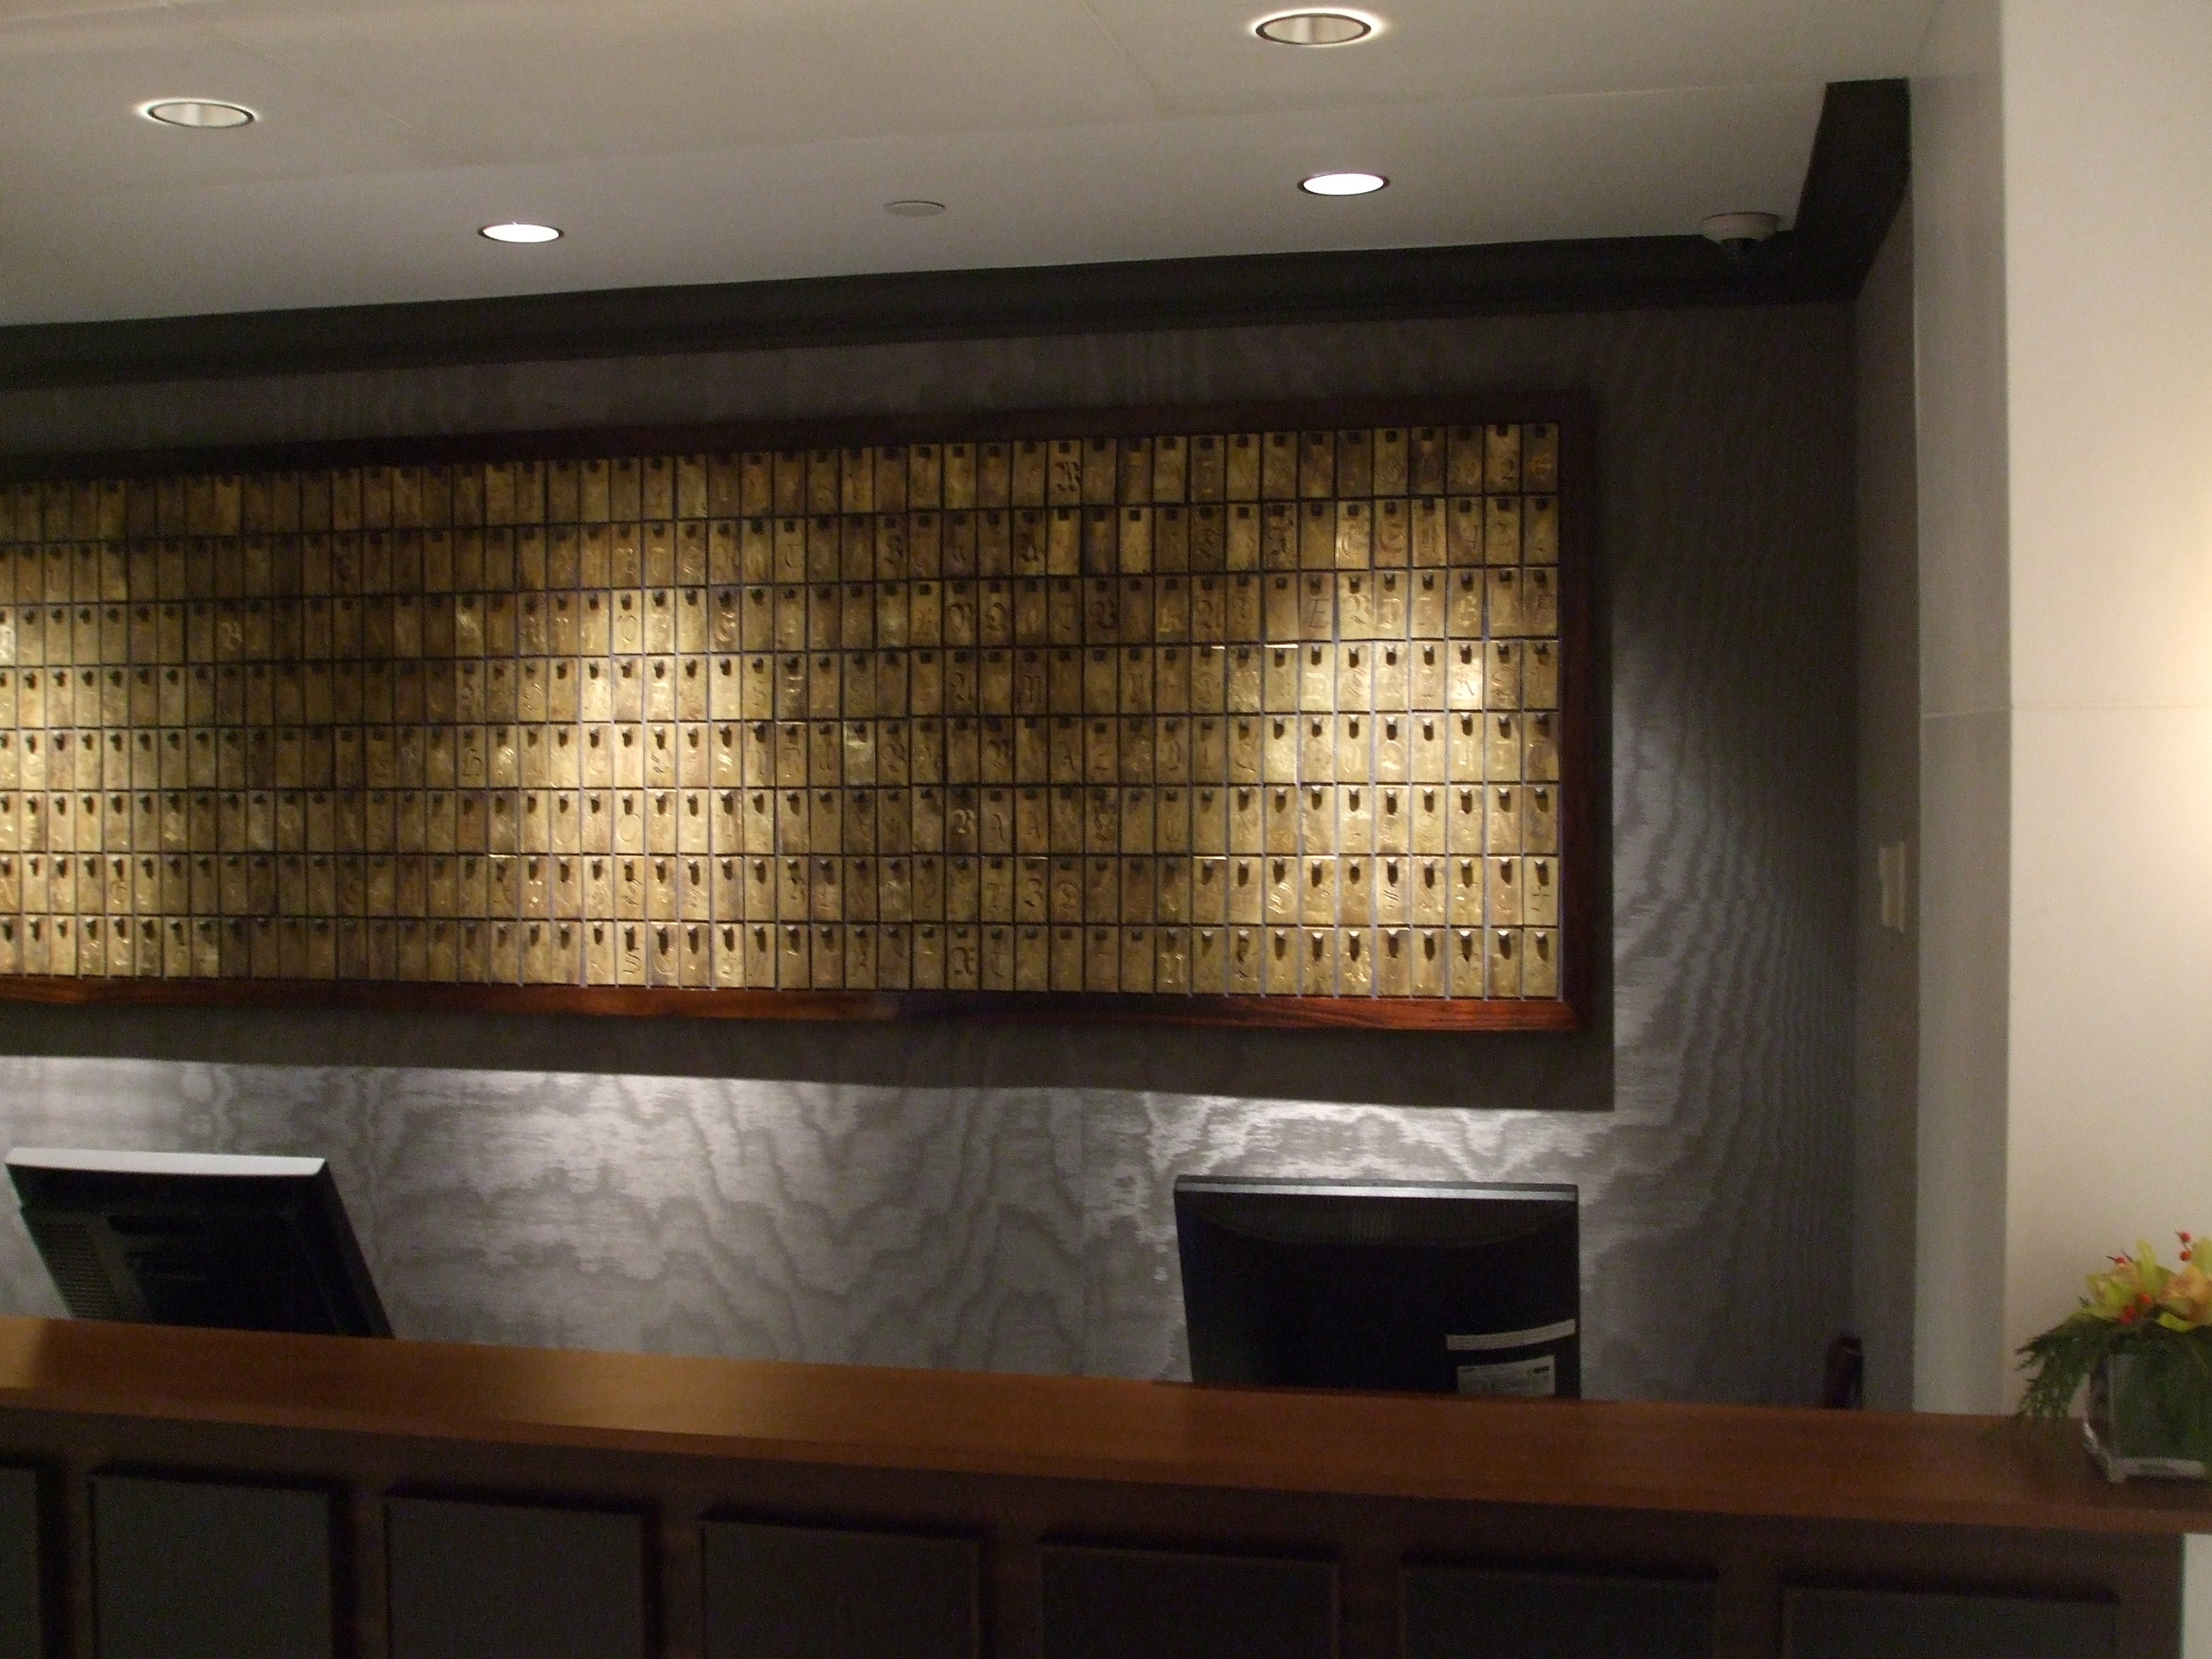 HVC-Lobby-Front Desk-DAC Art Piece-Art 100 (3) copy (deleted 193309a886f756265913204915af727c).JPG